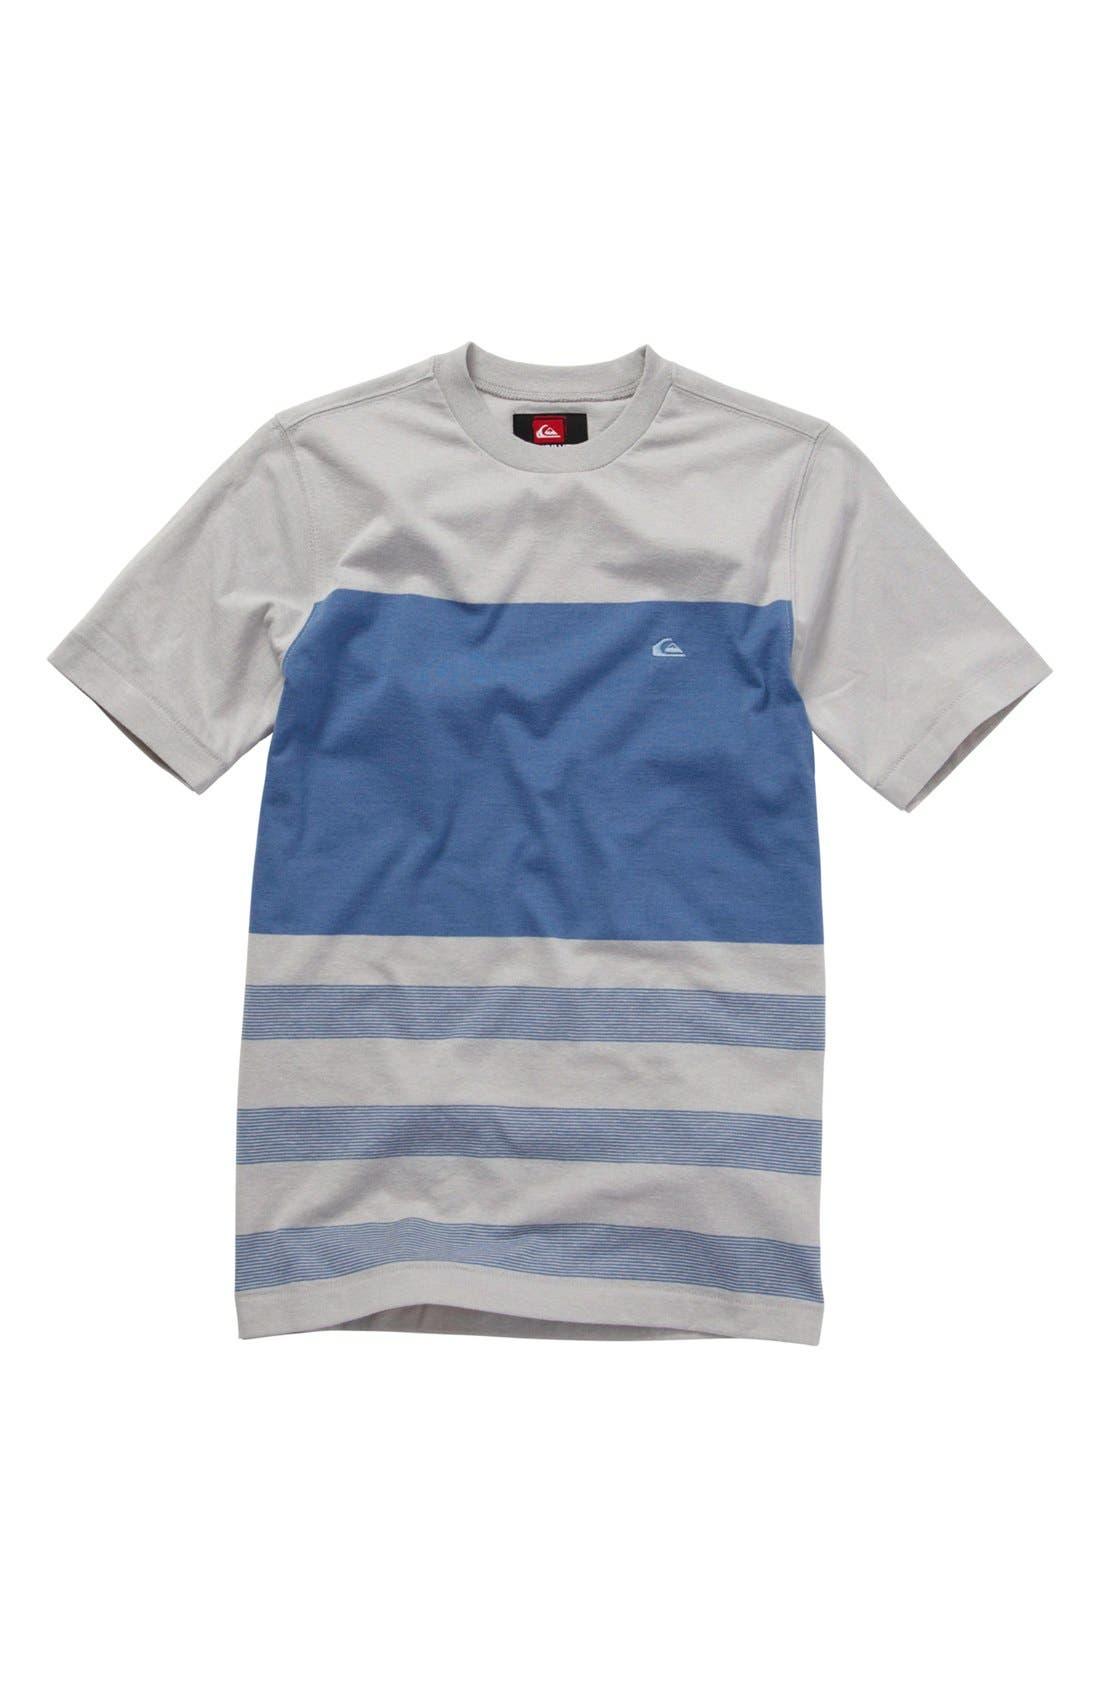 Alternate Image 1 Selected - Quiksilver 'Migo' Short Sleeve T-Shirt (Little Boys & Big Boys)